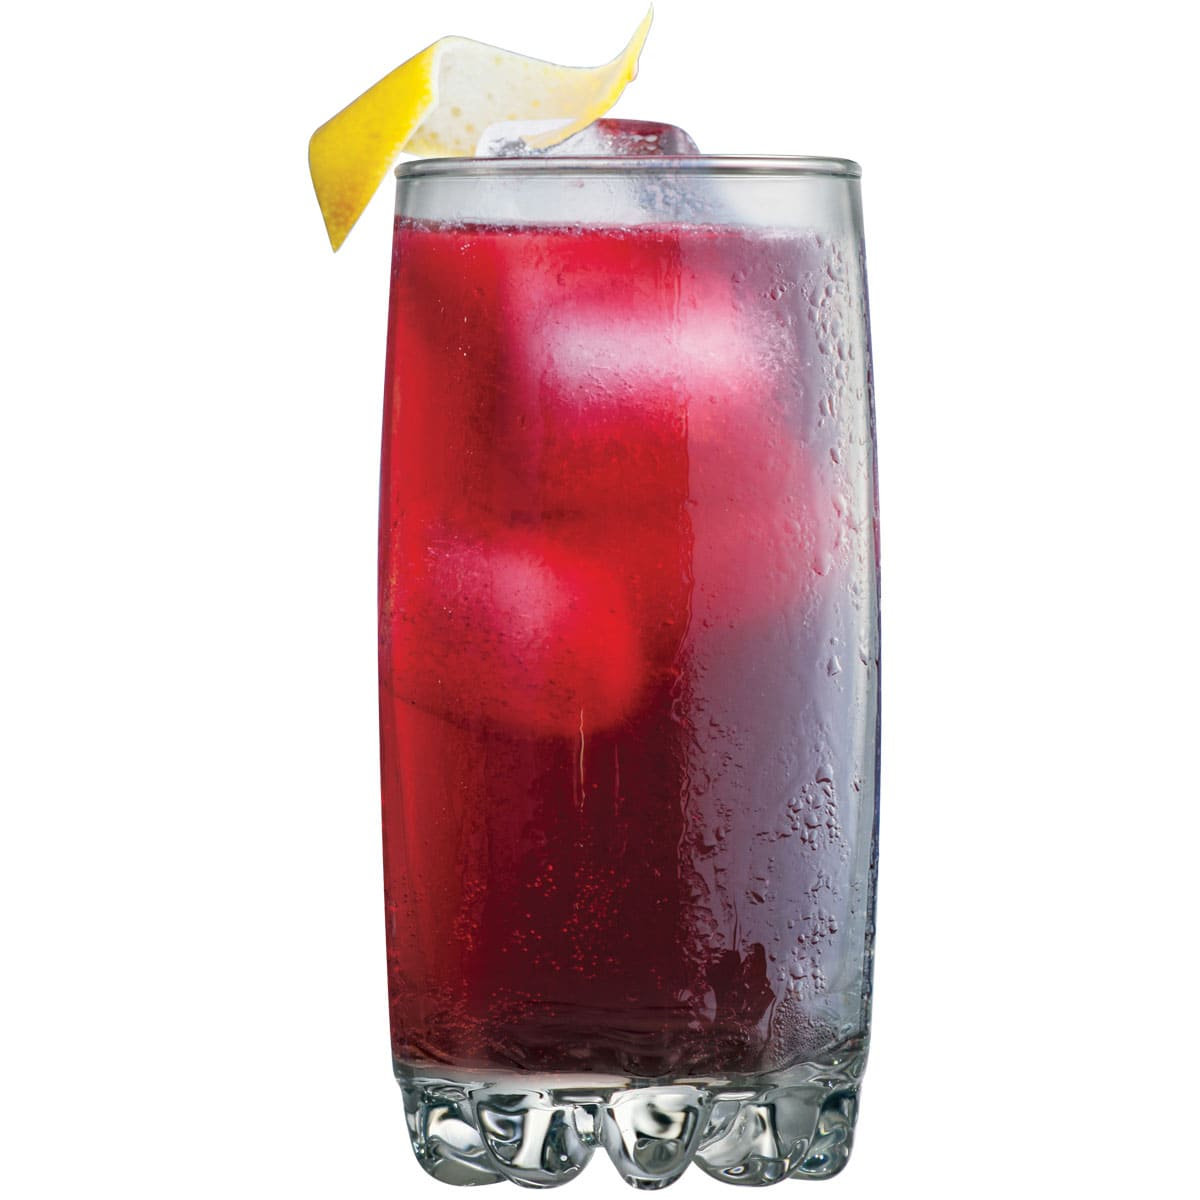 Copo de Vidro Riviera Long Drink 385ml (Caixa com 24 unidades)